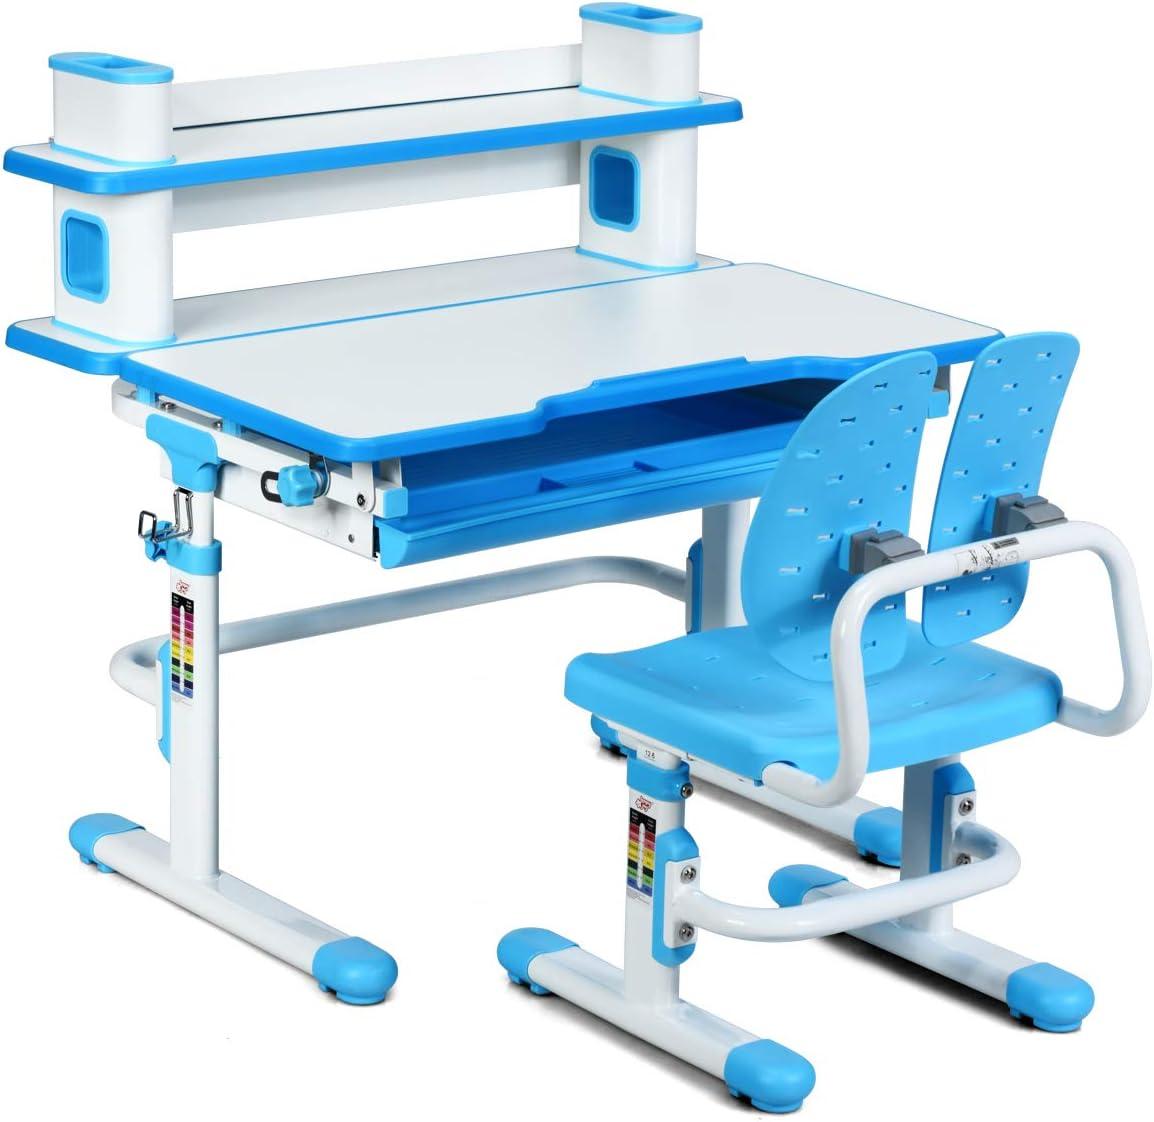 Amazon.com: HONEY JOY Kids Desk and Chair Set, Height ...